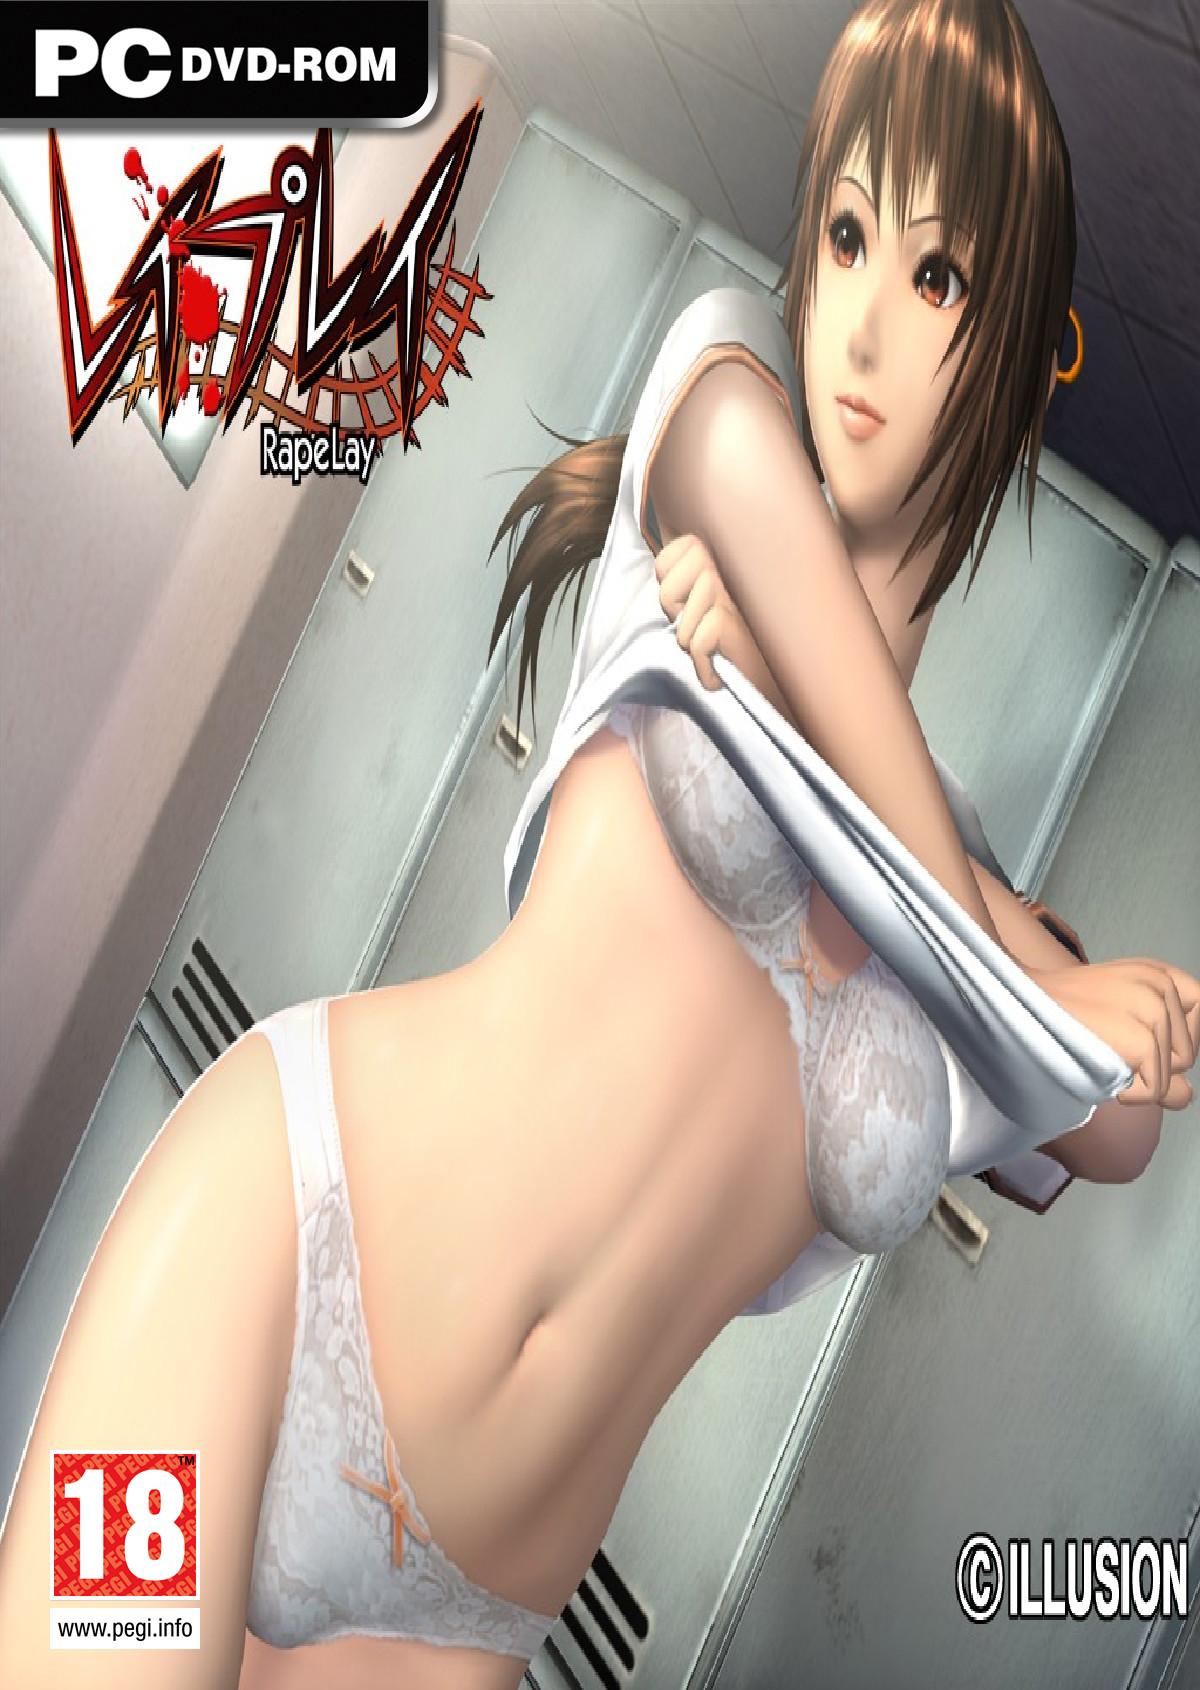 Japanese sex video games